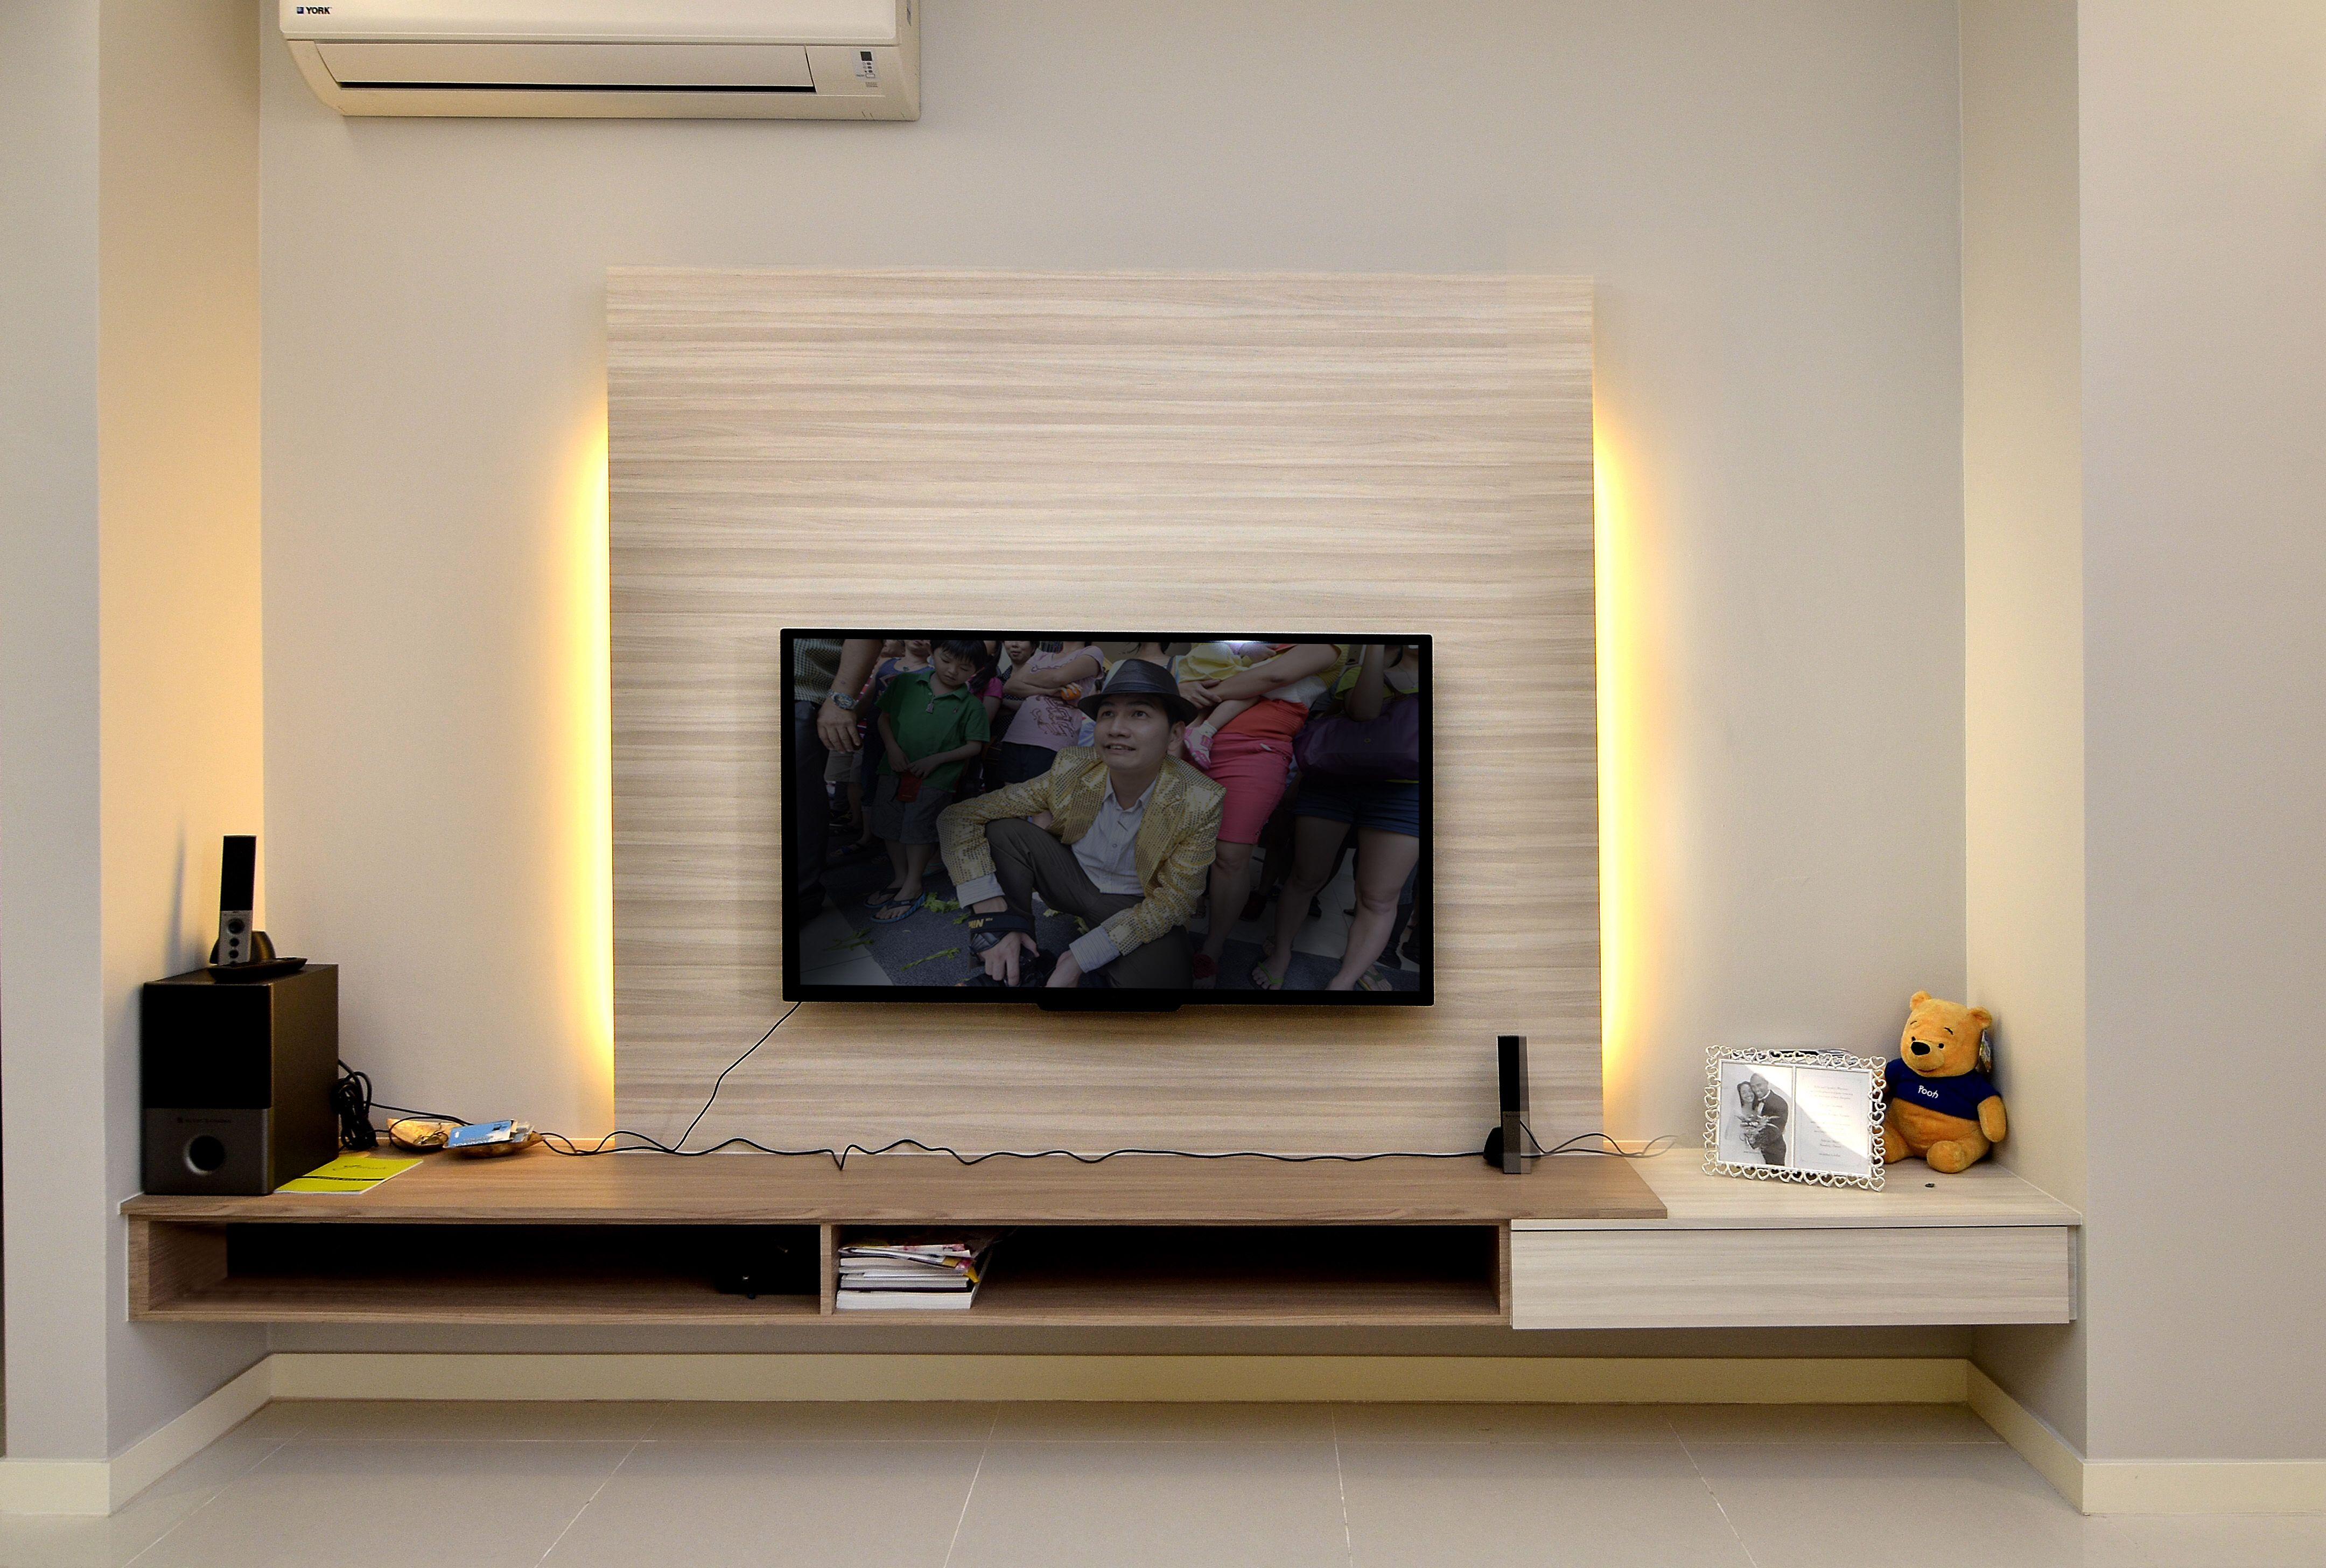 #tv #console #cabinet #livingroom #design #woodwork